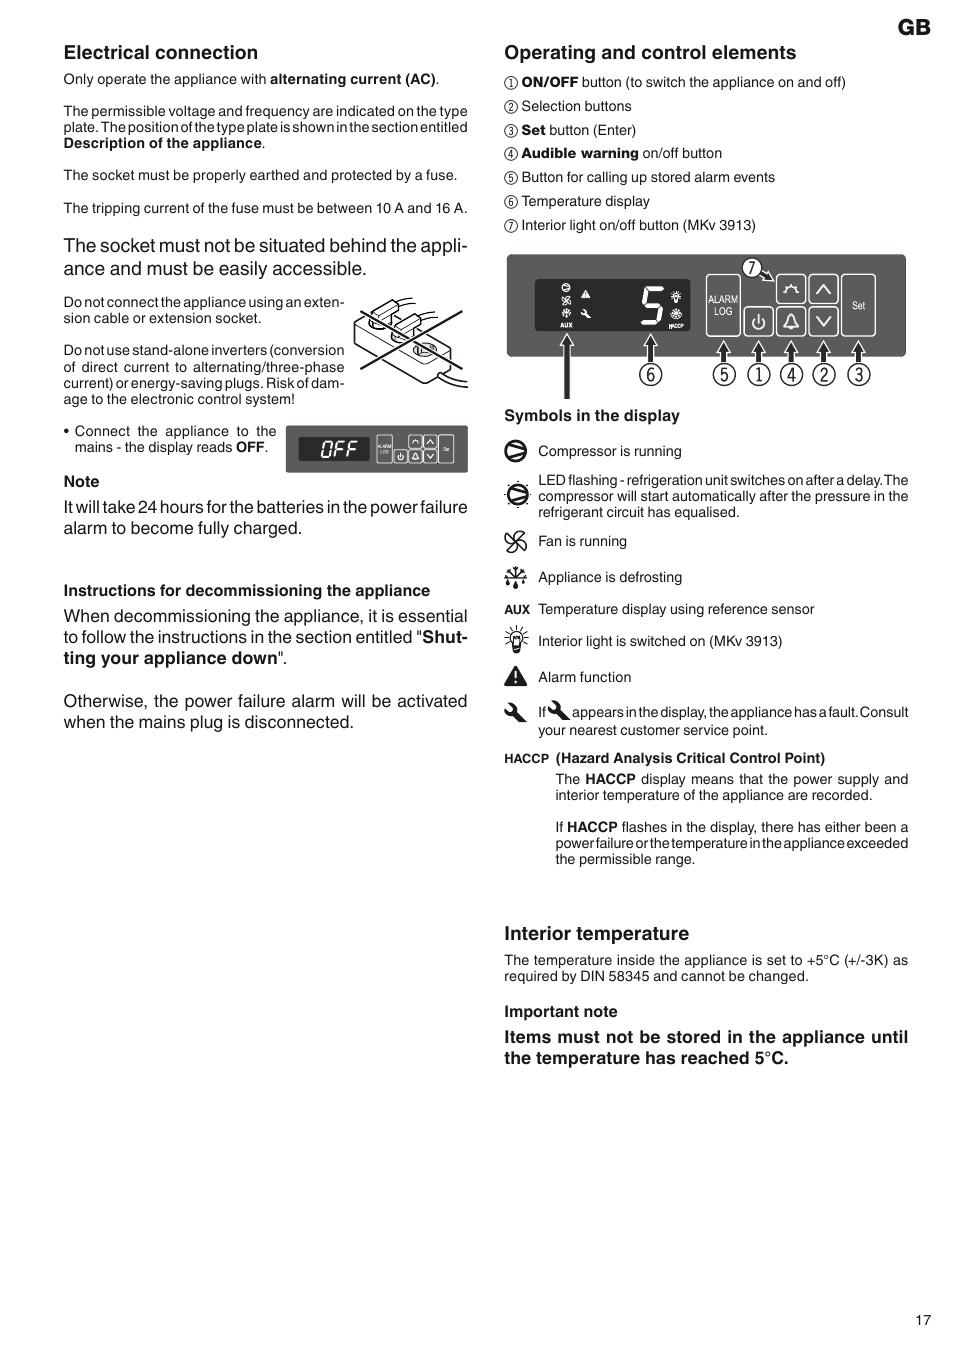 Liebherr MKv 3910 User Manual | Page 5 / 13